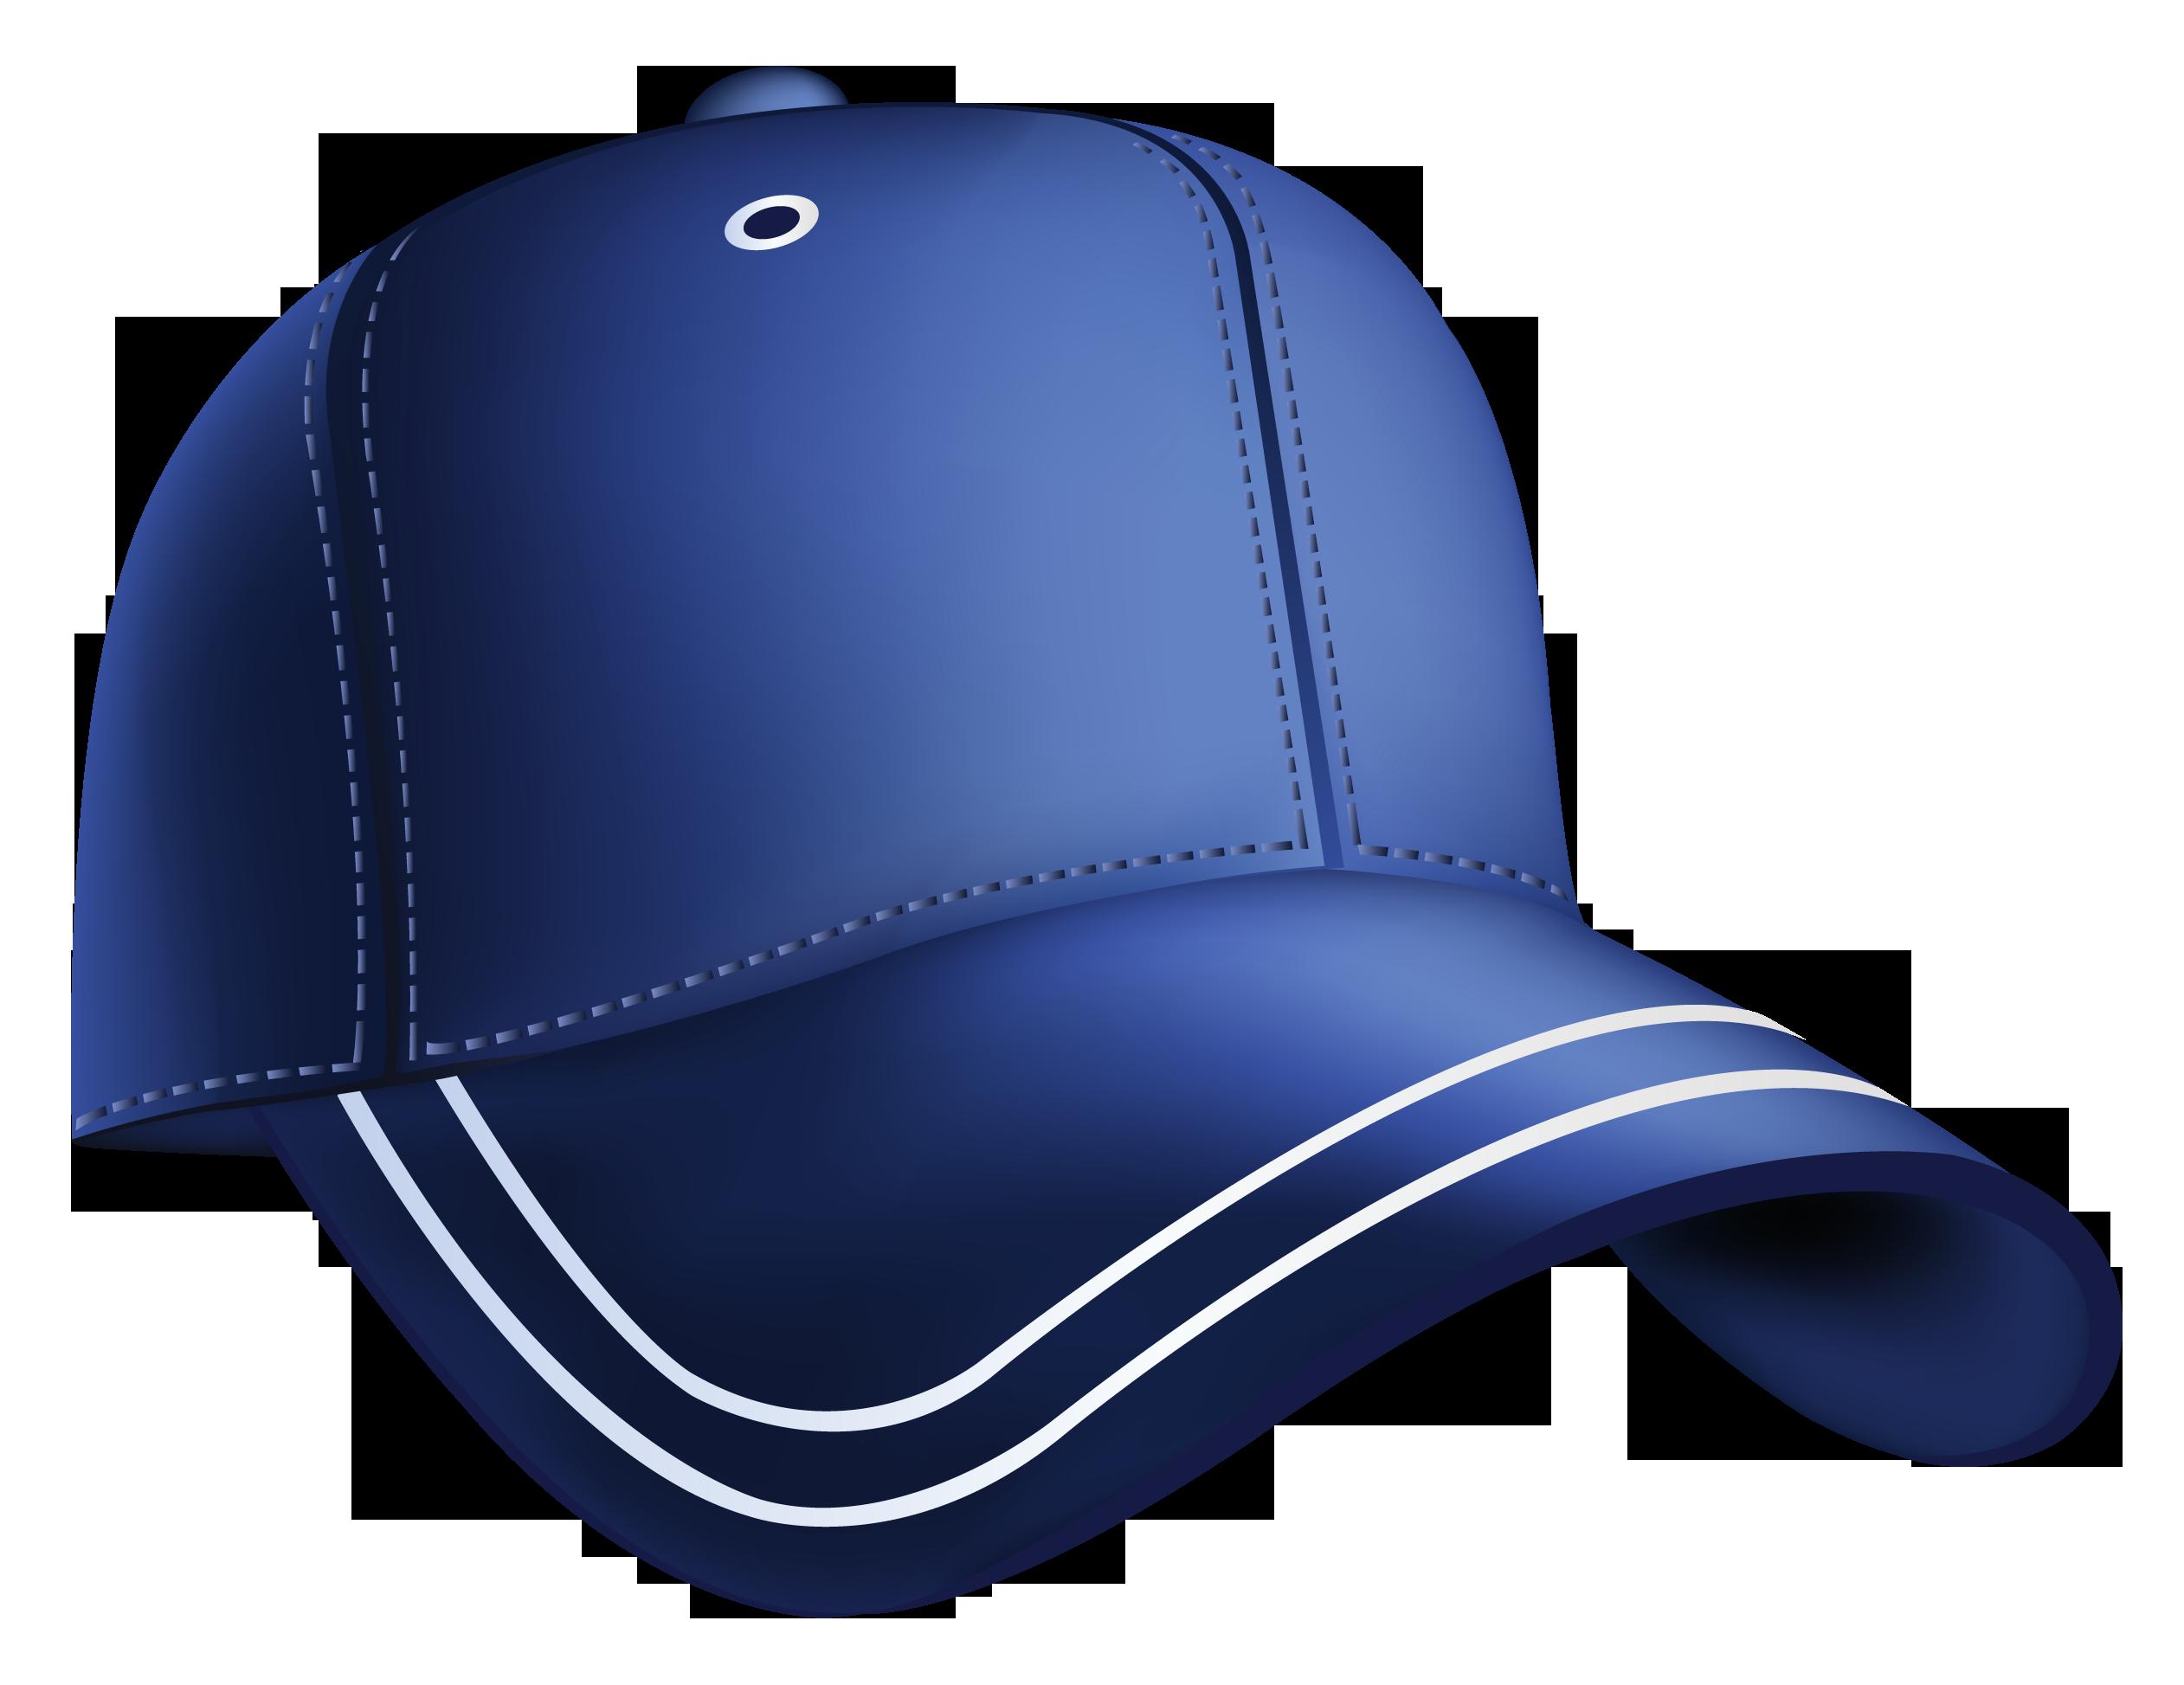 Baseball hat baseball cap clipart